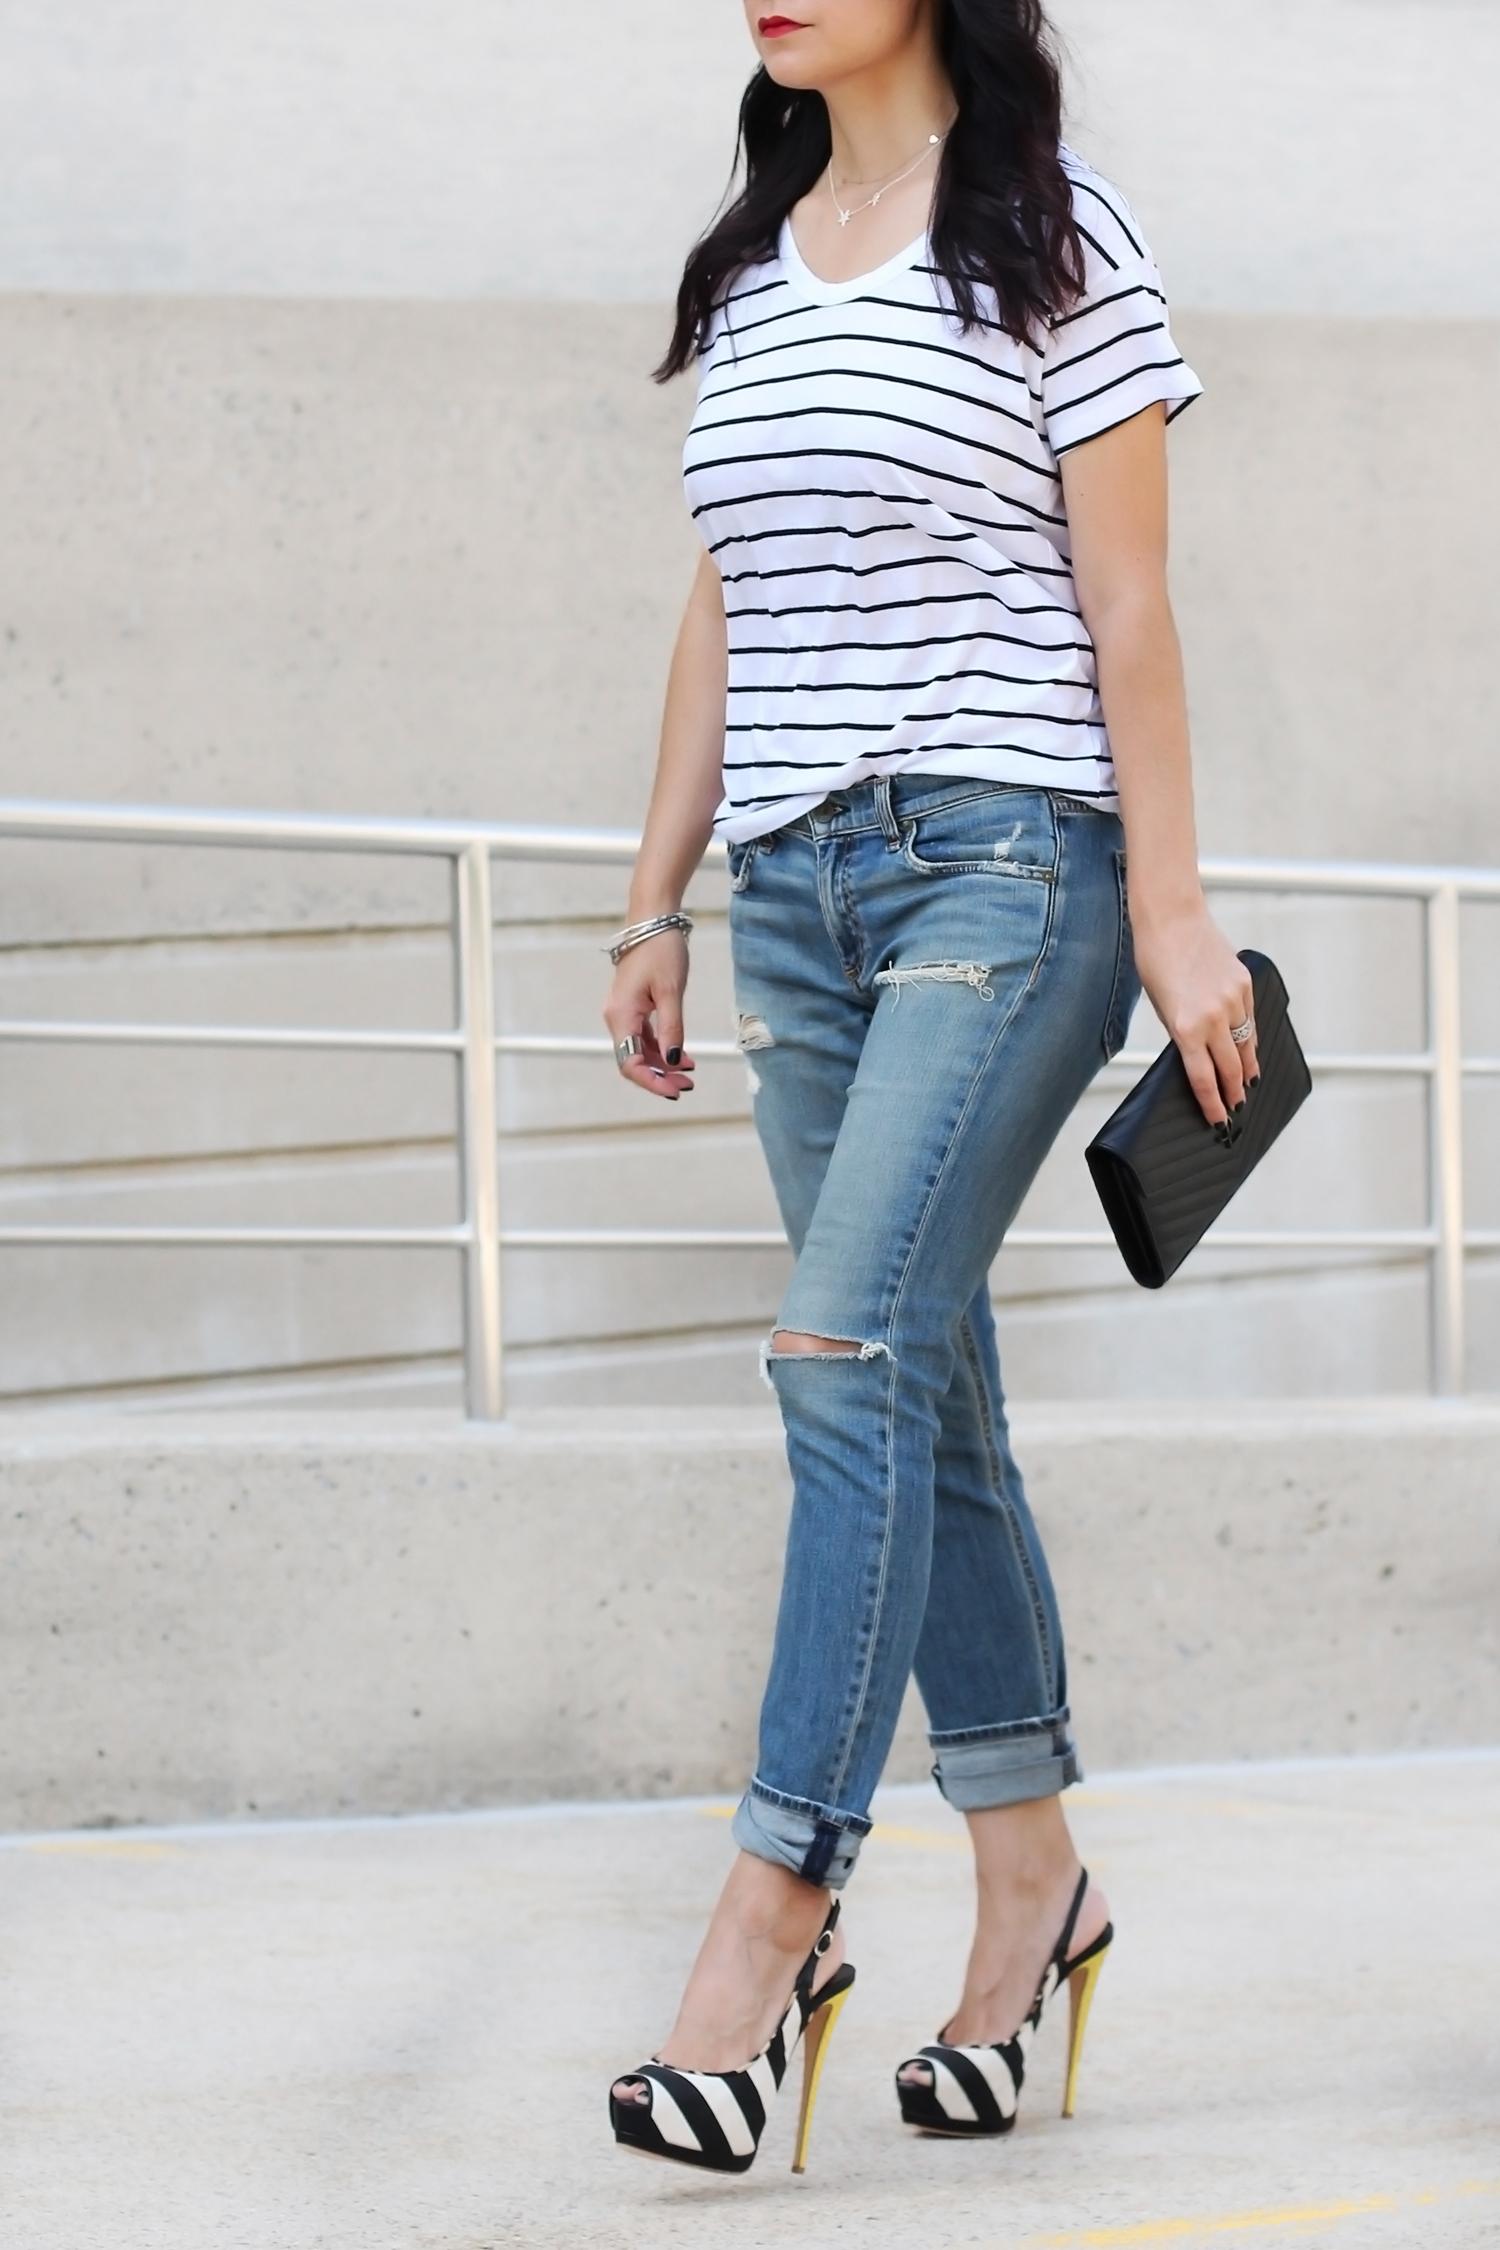 Stripe Shirt Look